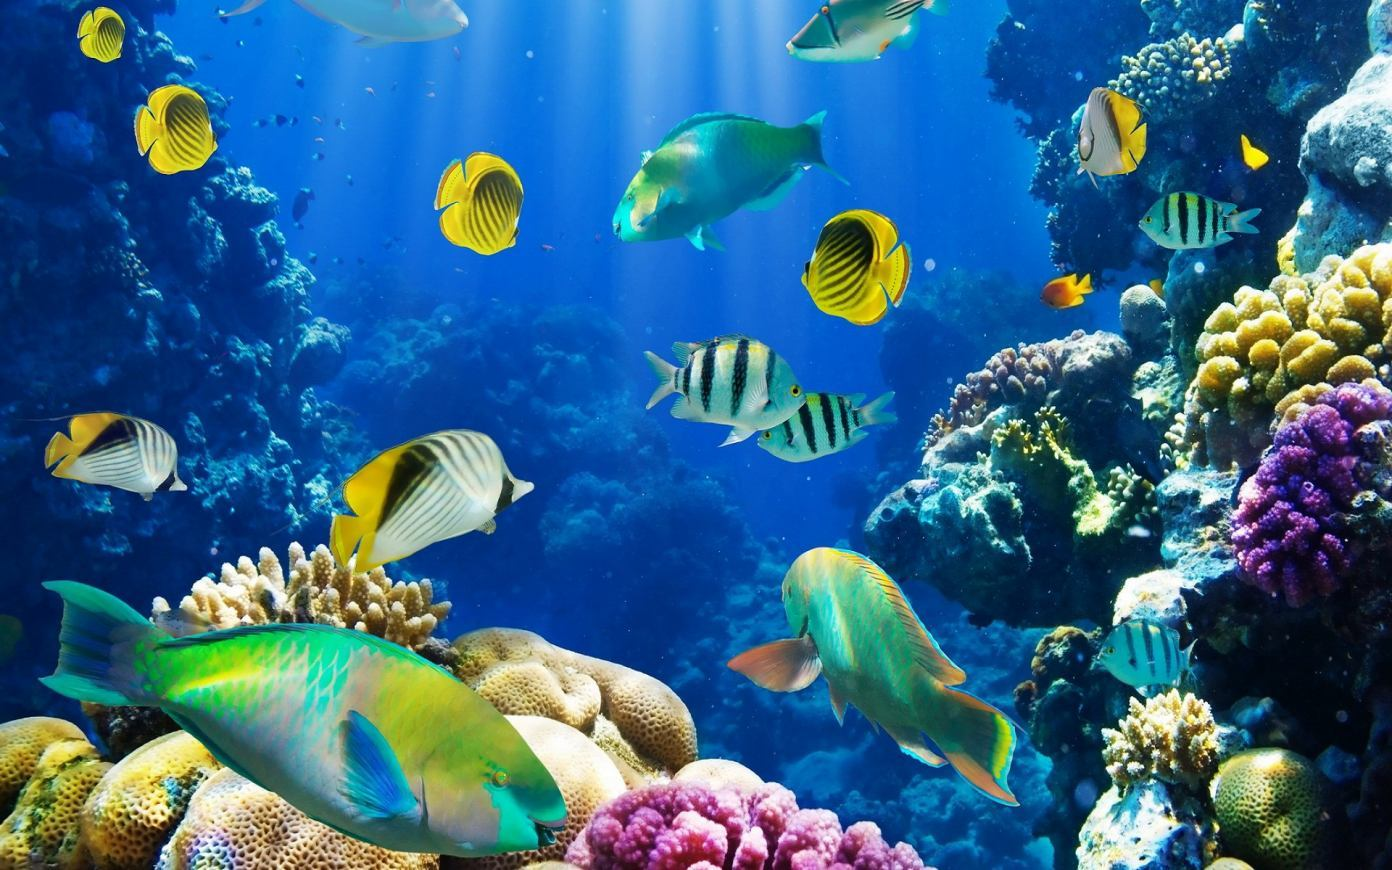 Fish Wallpaper Hd Wallpapers